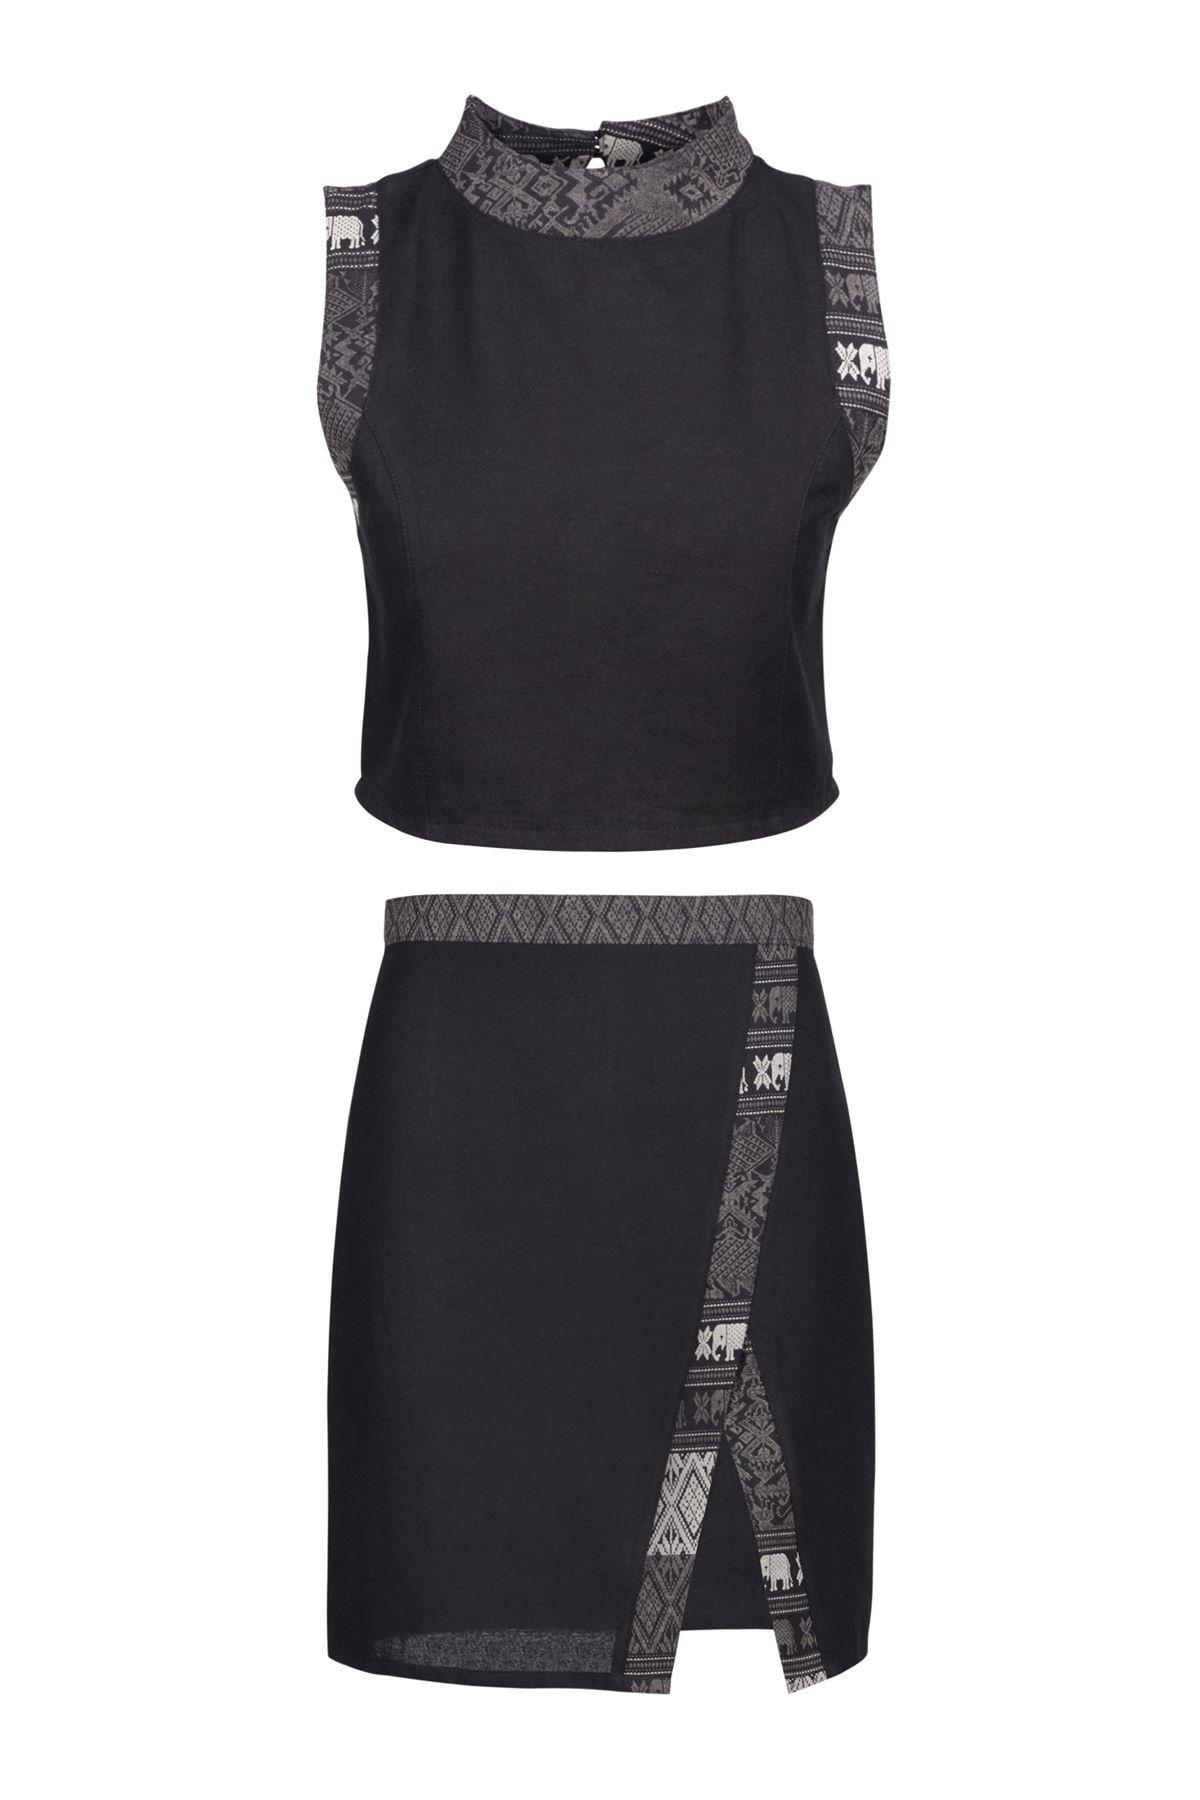 Lofbaz Women's Thai Cotton Top and Skirt Set Solid Black XL